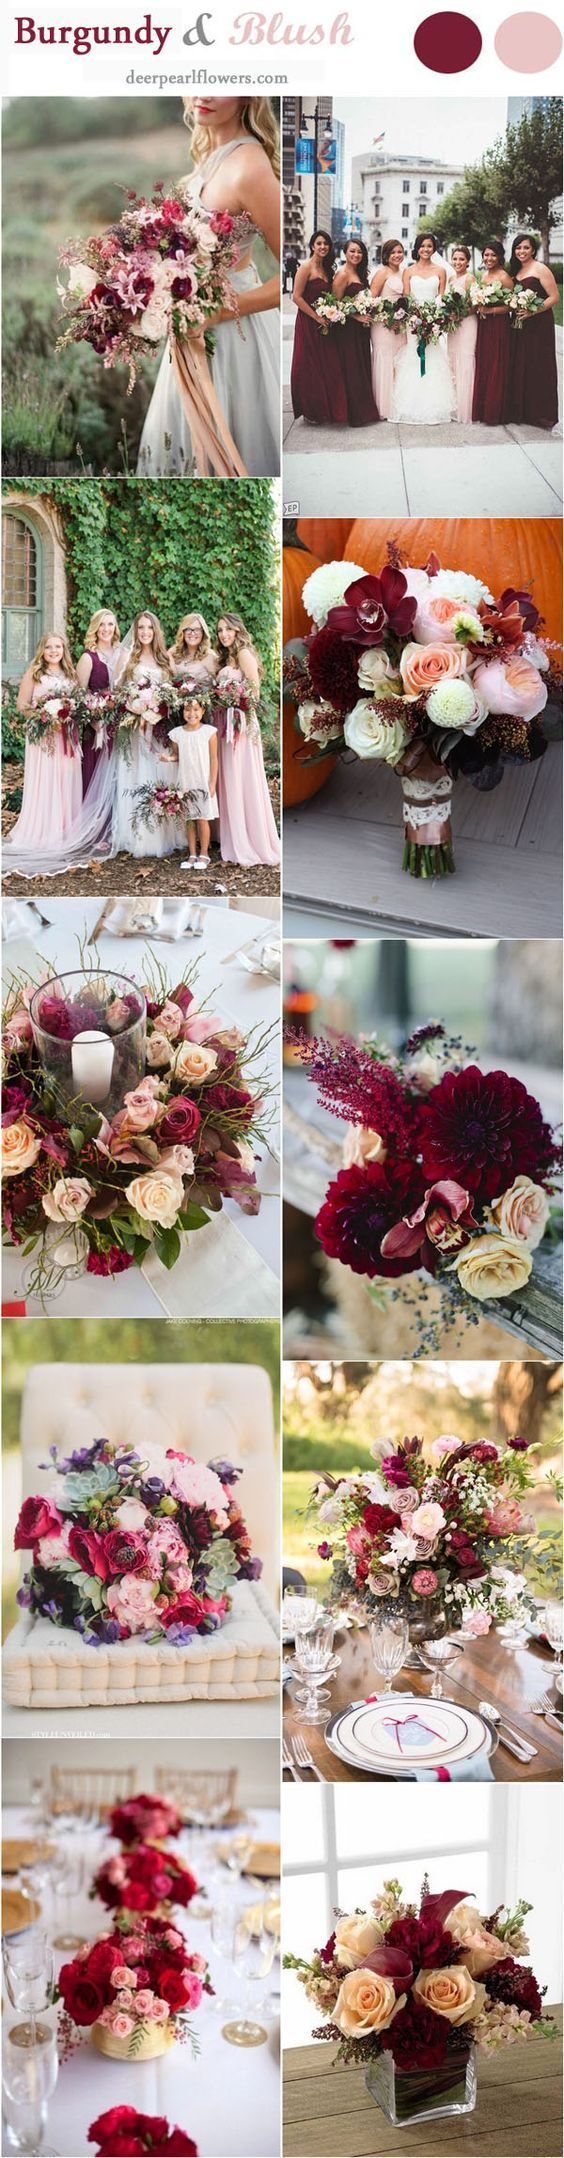 Wedding decorations tulle and lights october 2018  best Wedding images on Pinterest  Wedding ideas Short wedding